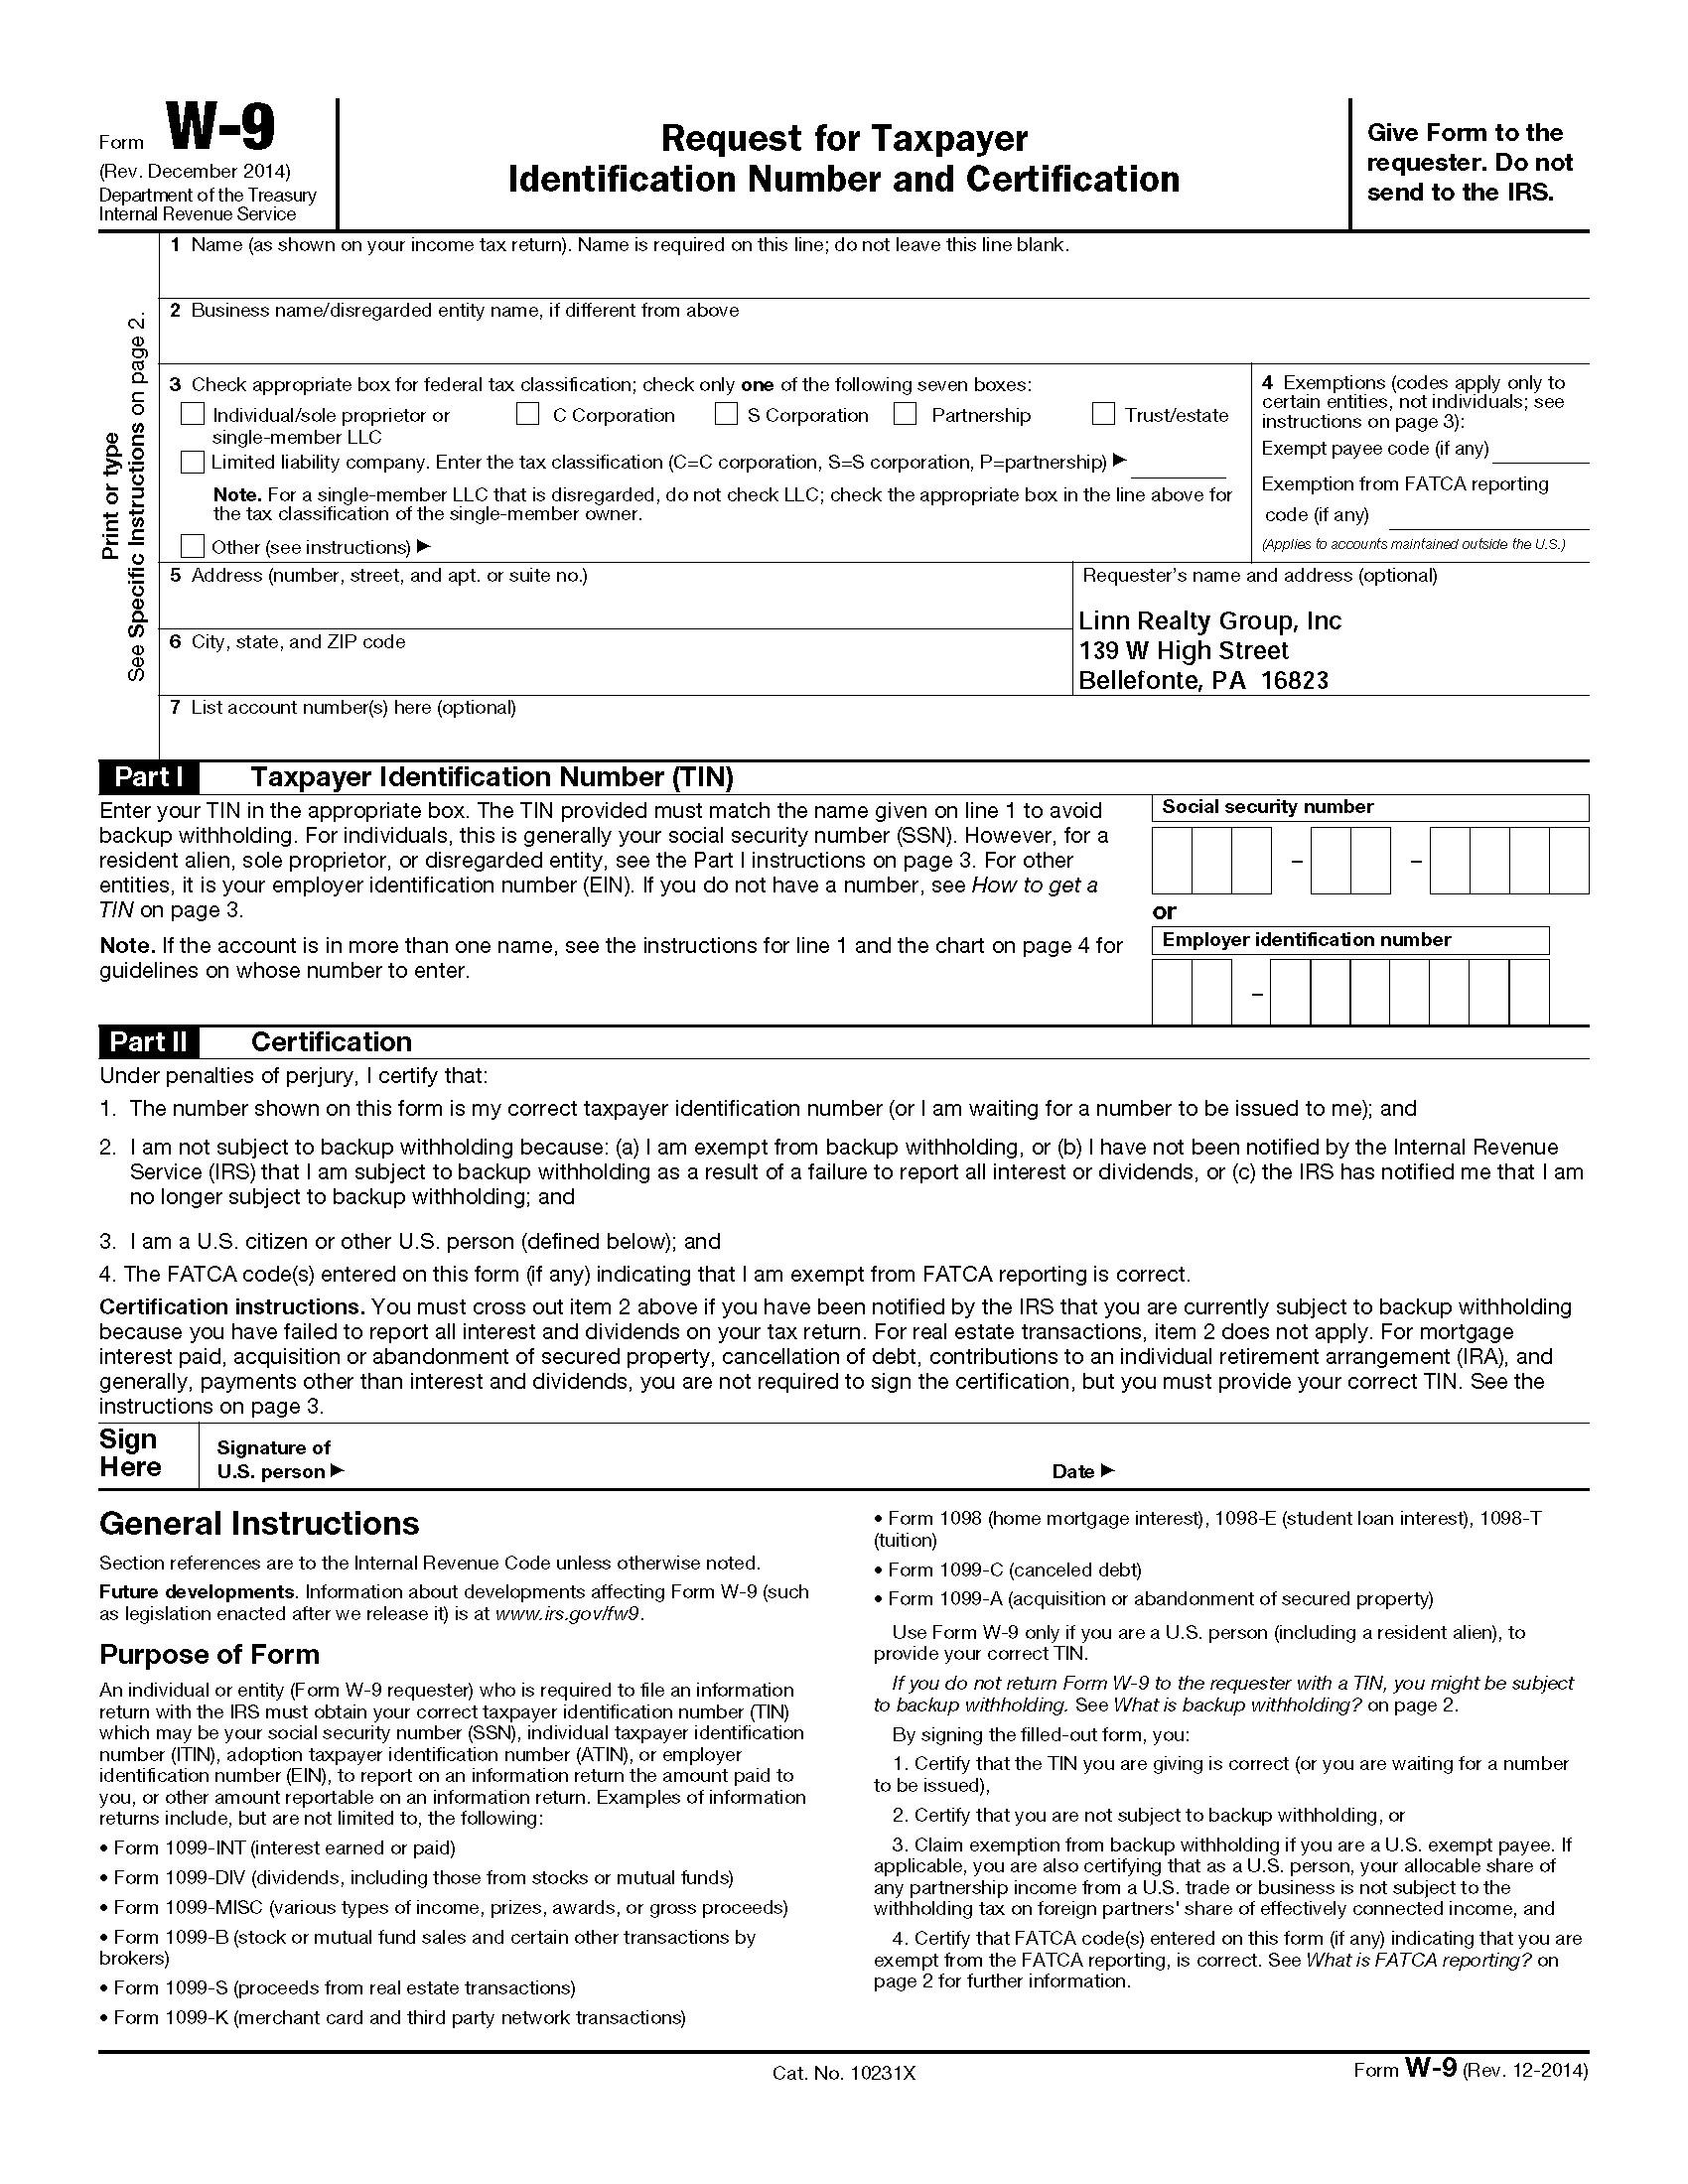 Blank 2019 W 9 Form Printable | Calendar Template Printable-Blank W 9 Form 2020 Printable Free